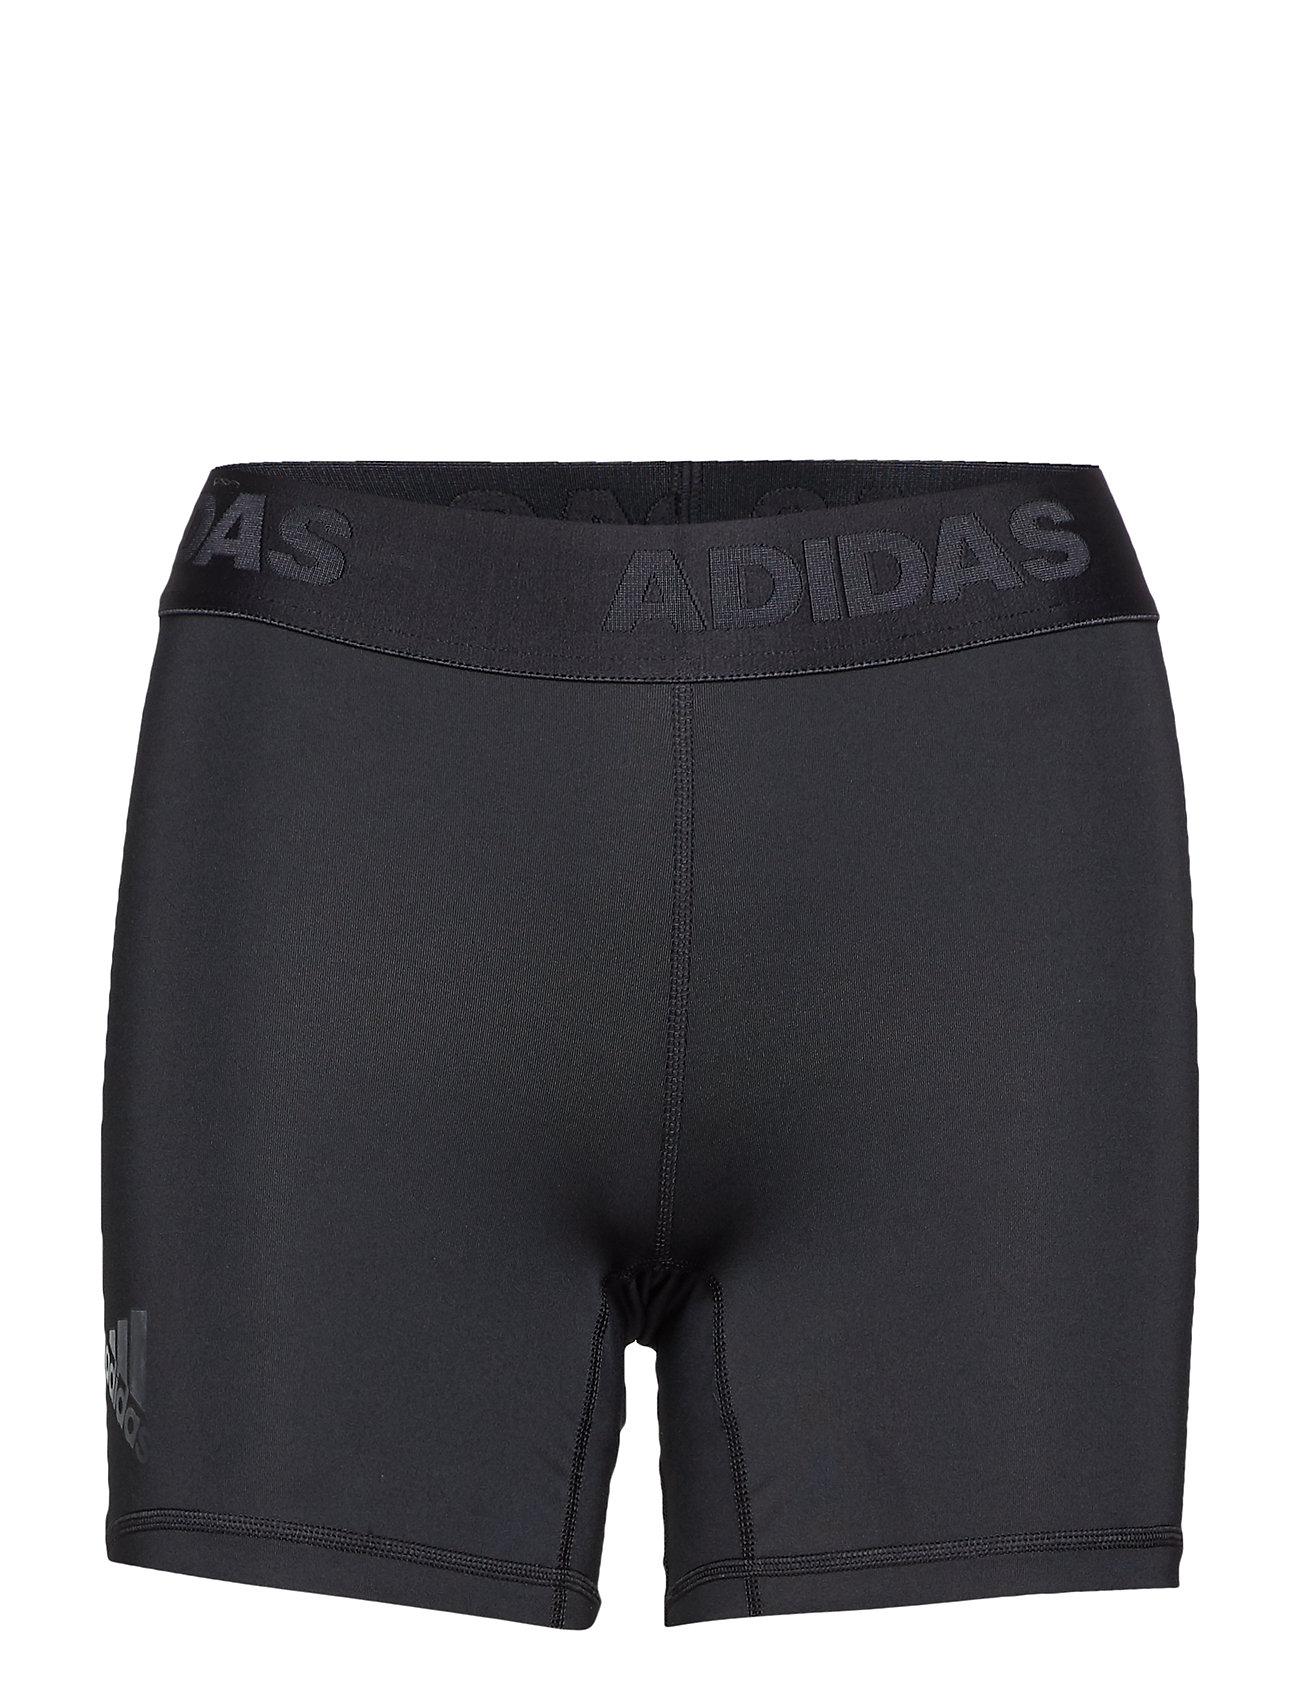 Adidas ASK SPR TIG ST5 Shorts